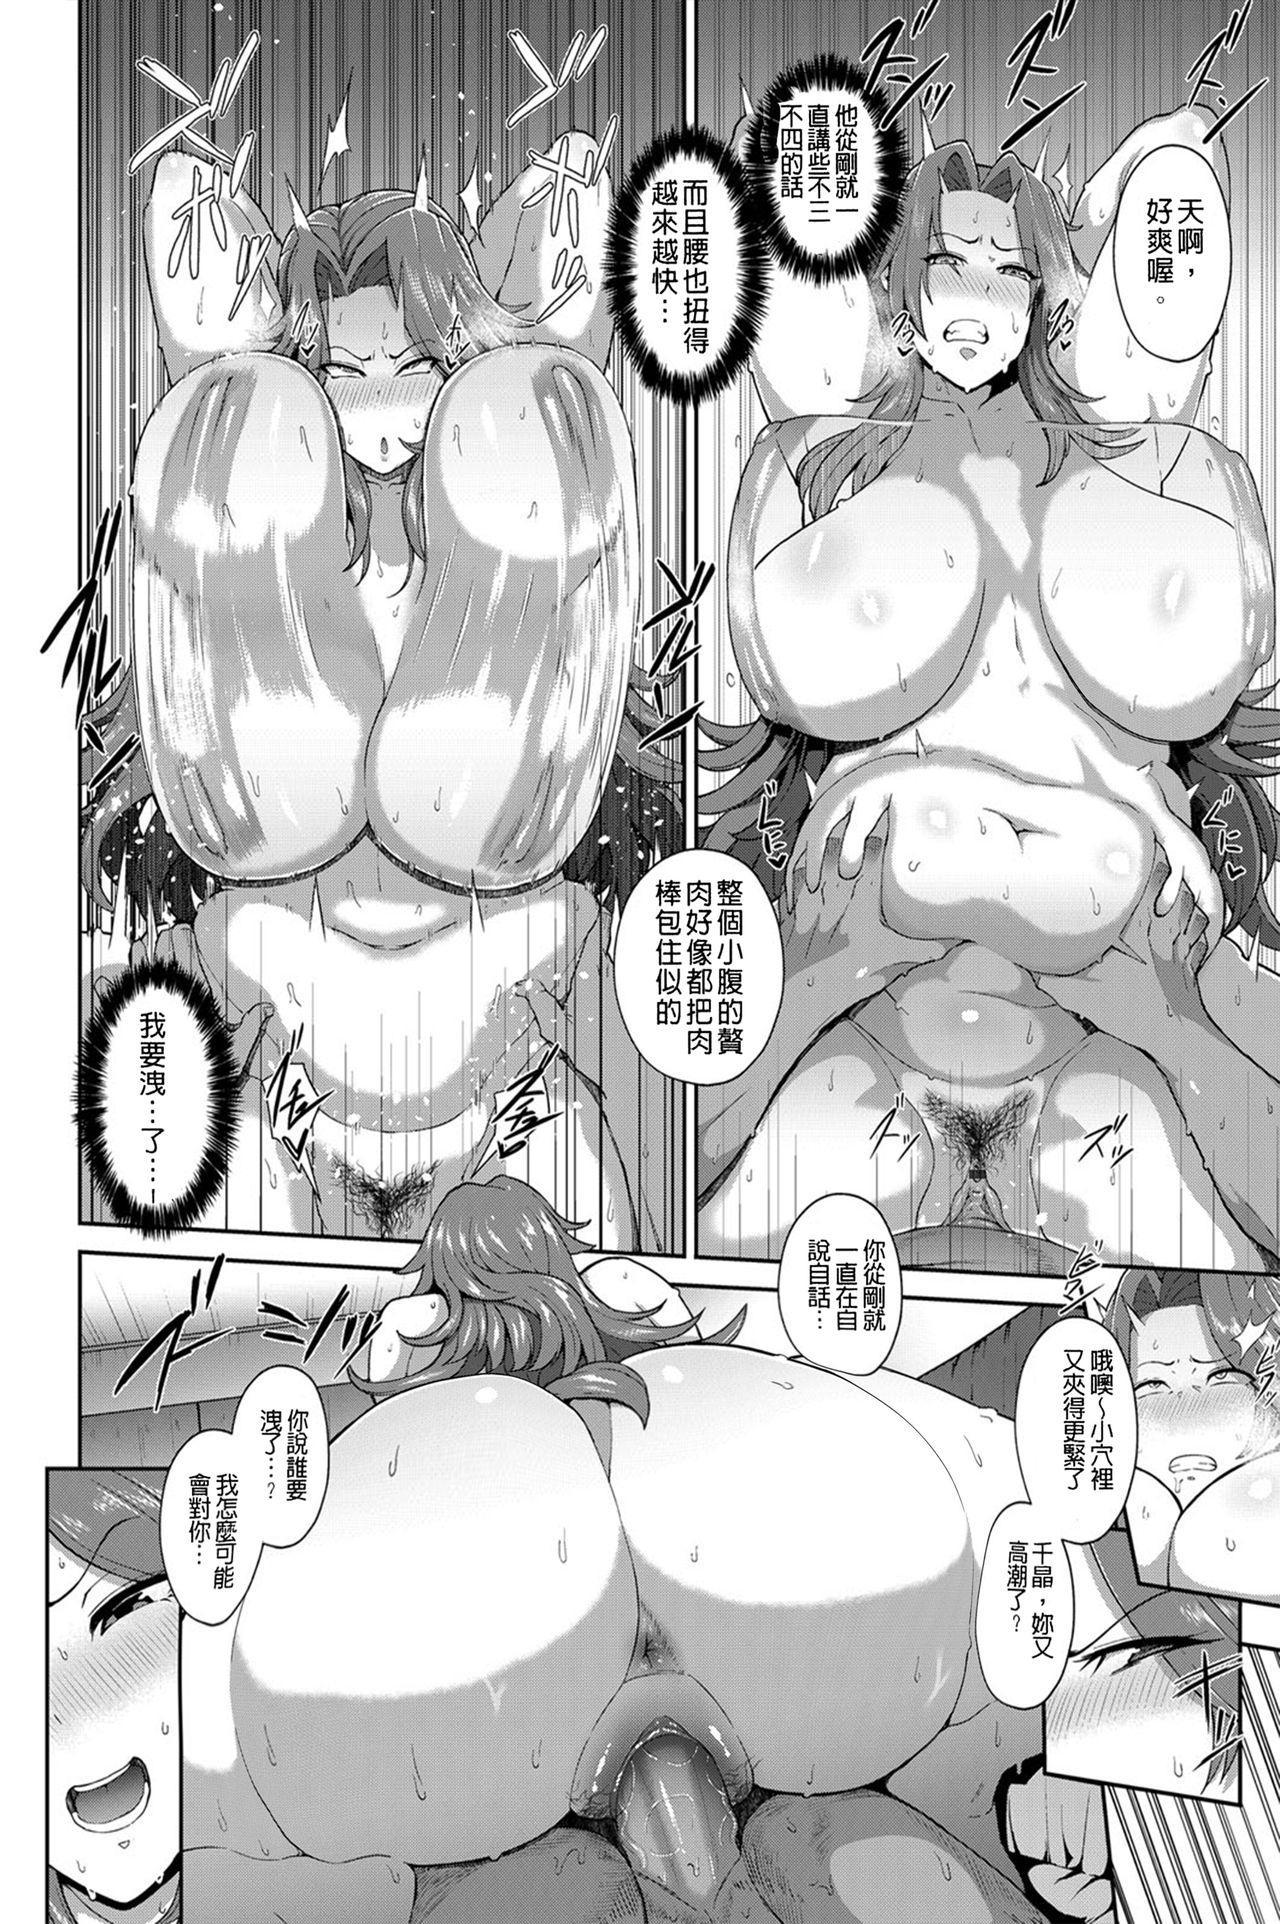 Juku Mesu - Erotic Mature Women 70